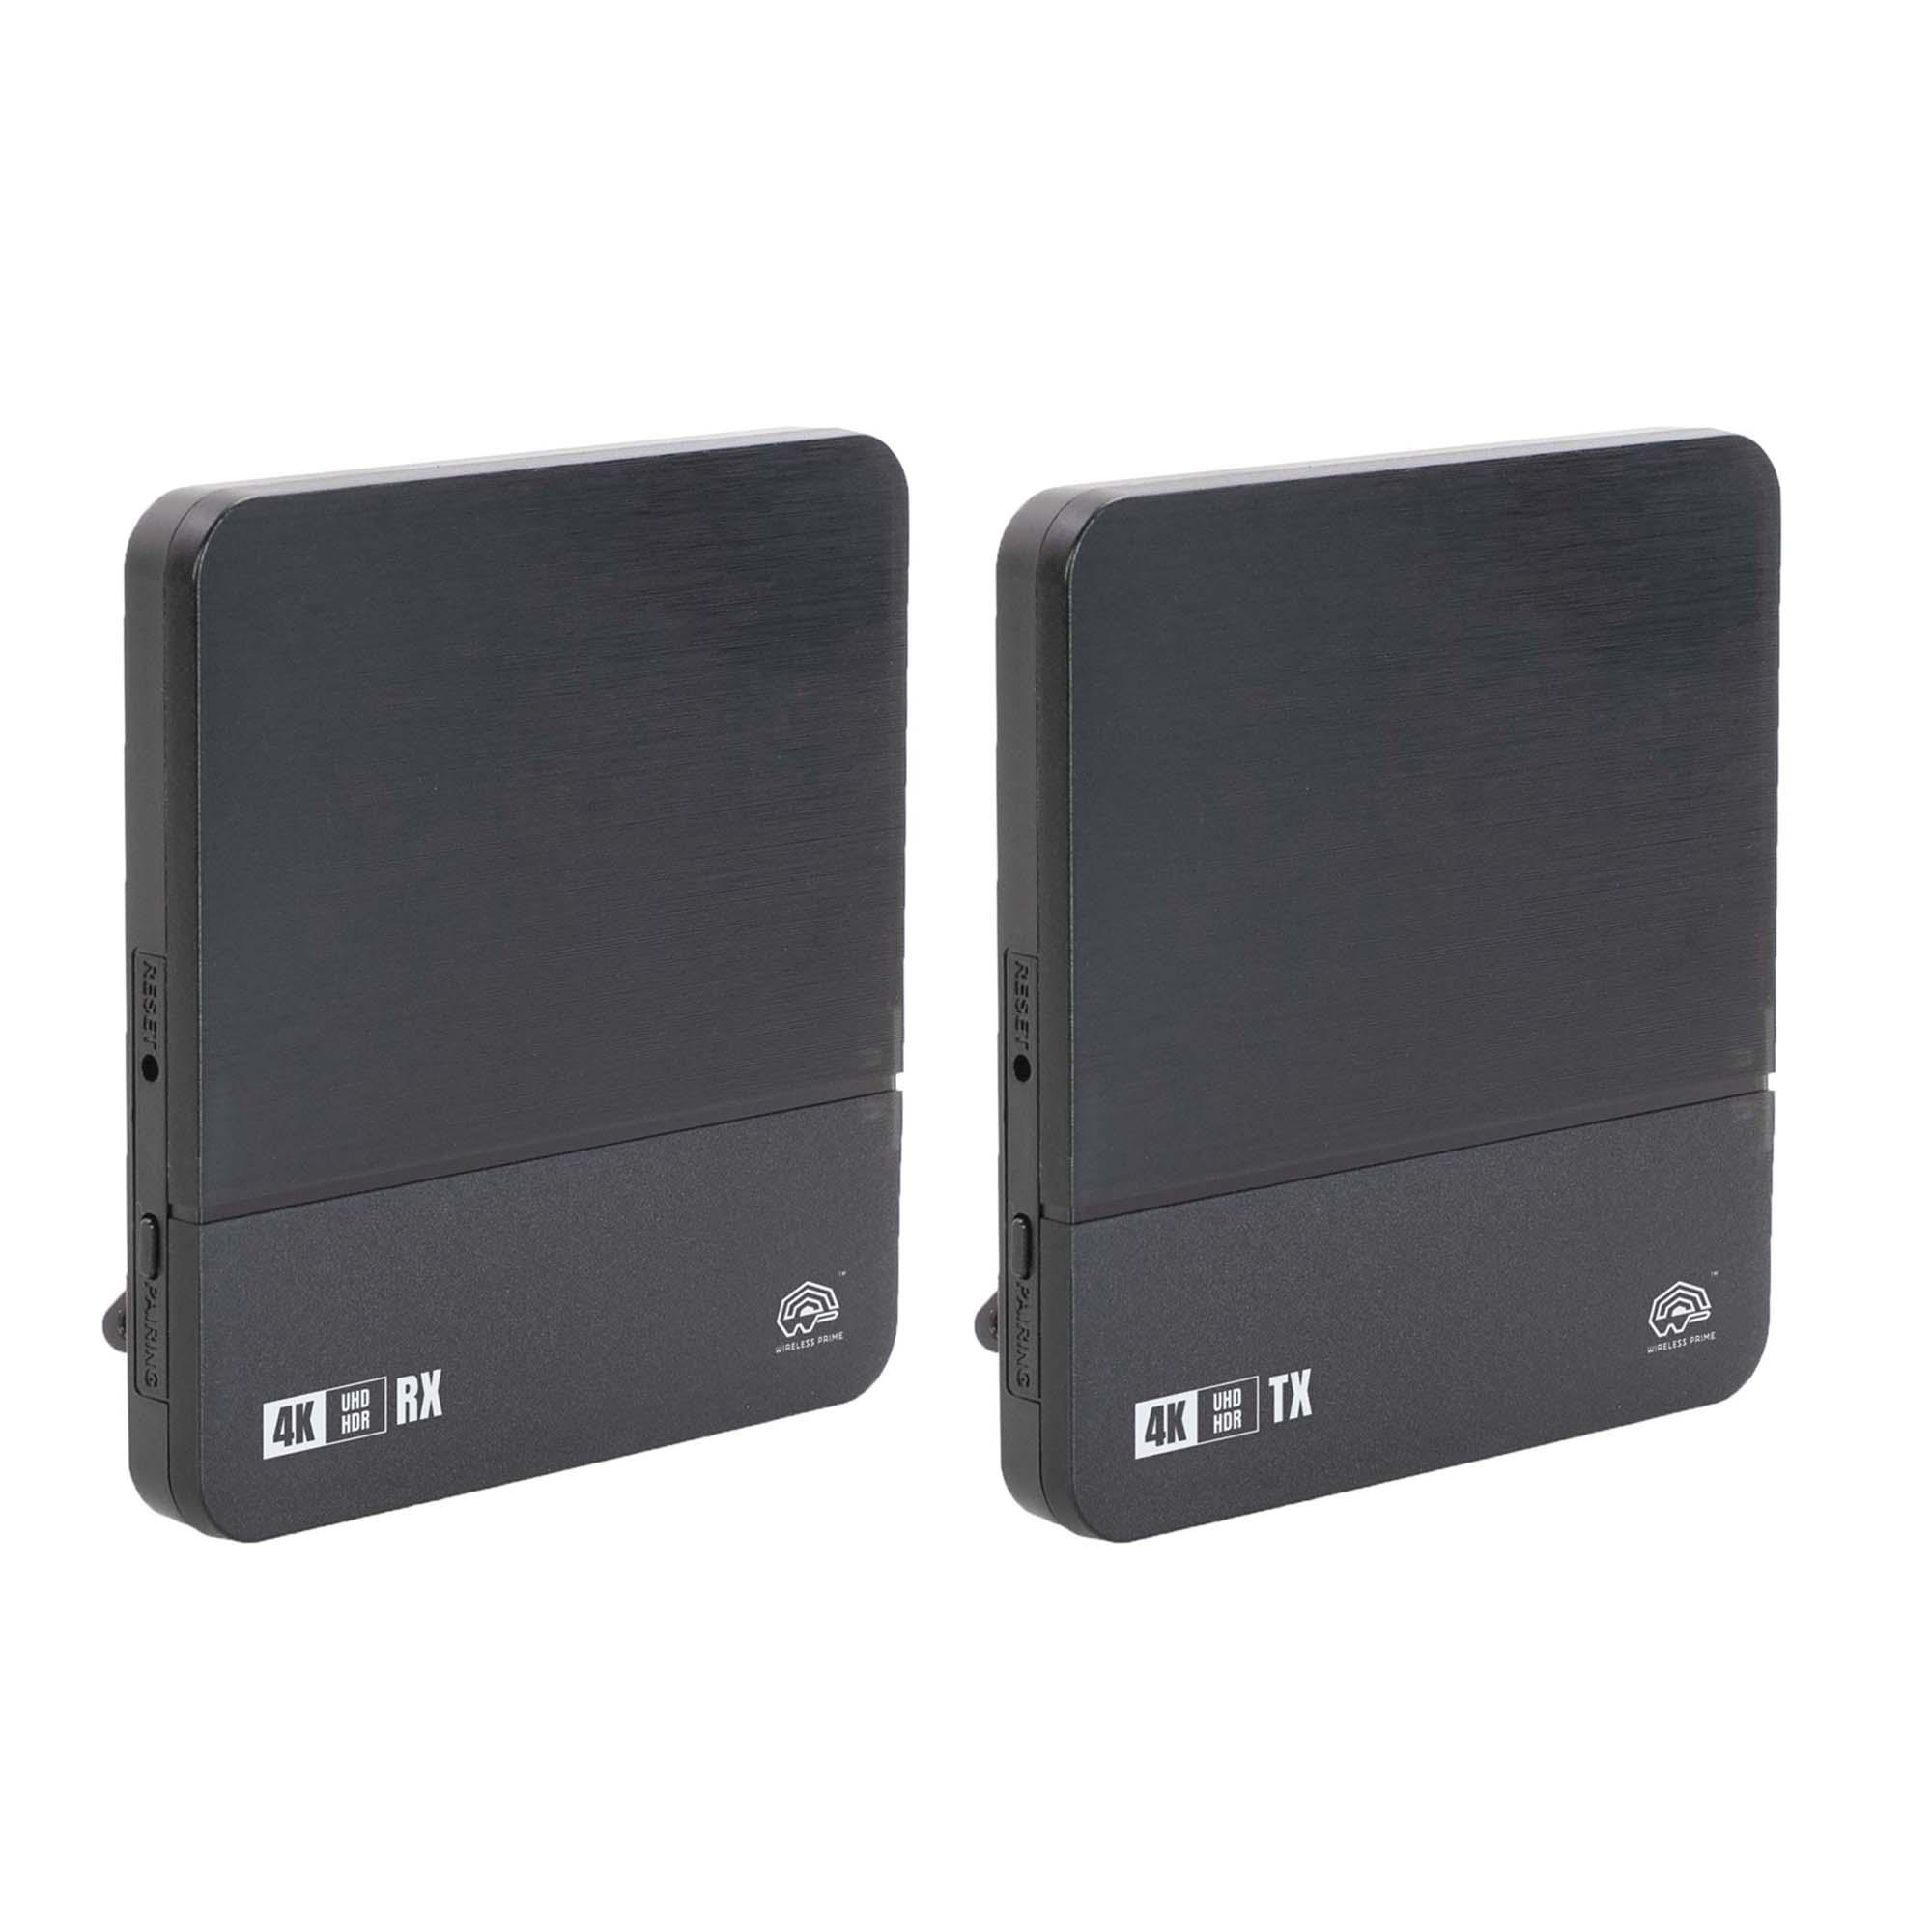 5-326_4K_Wireless_Transmitter_Kit